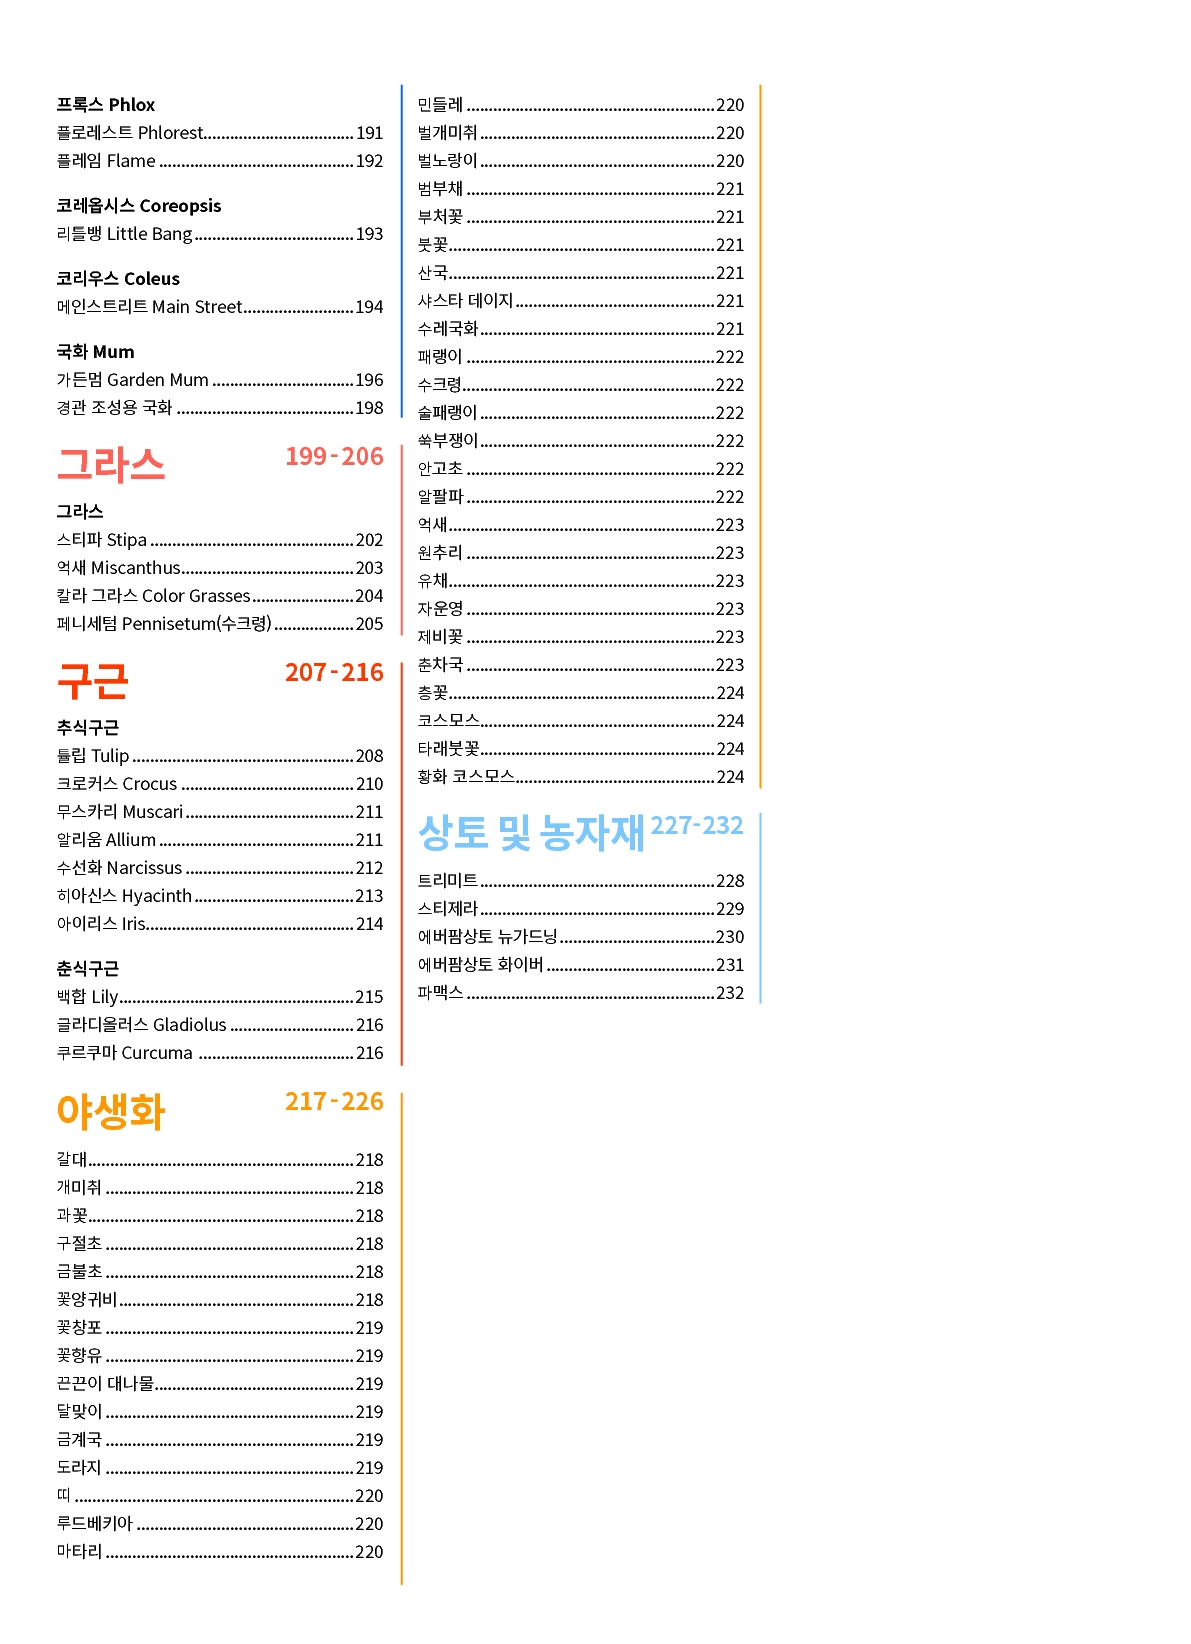 2020ef-collection.pdf_8